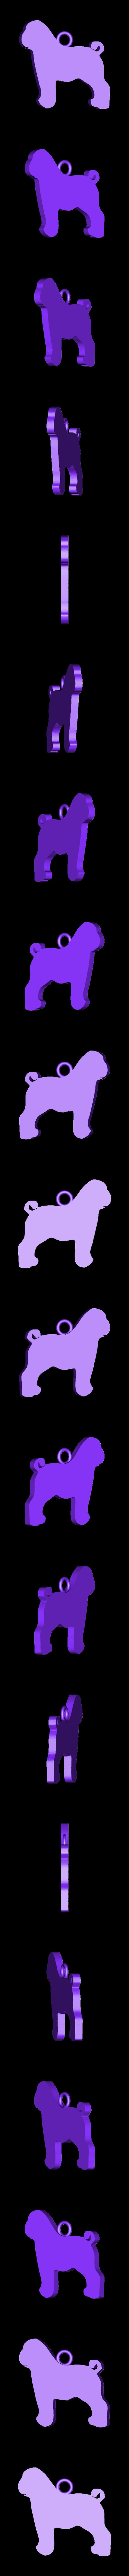 27.stl Download STL file Dogs • 3D printing object, GENNADI3313